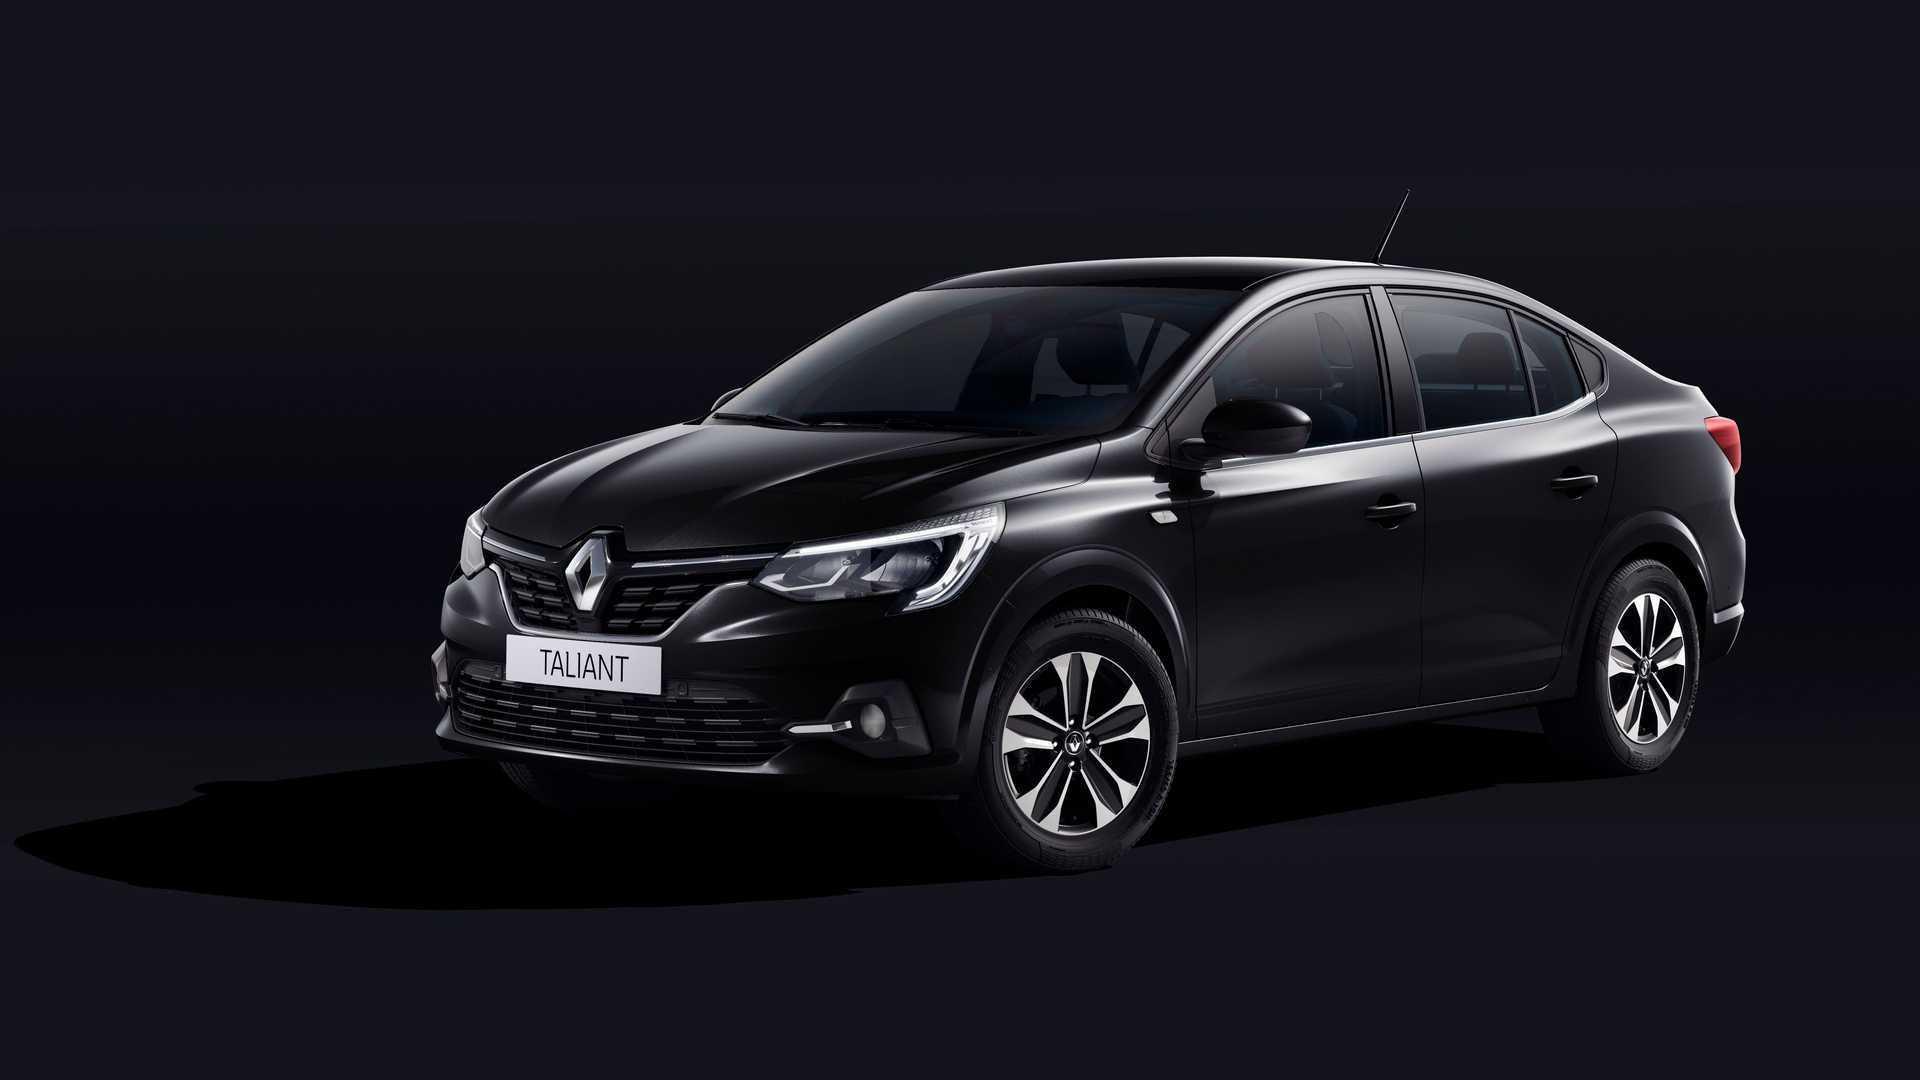 2021_Renault_Taliant-0005